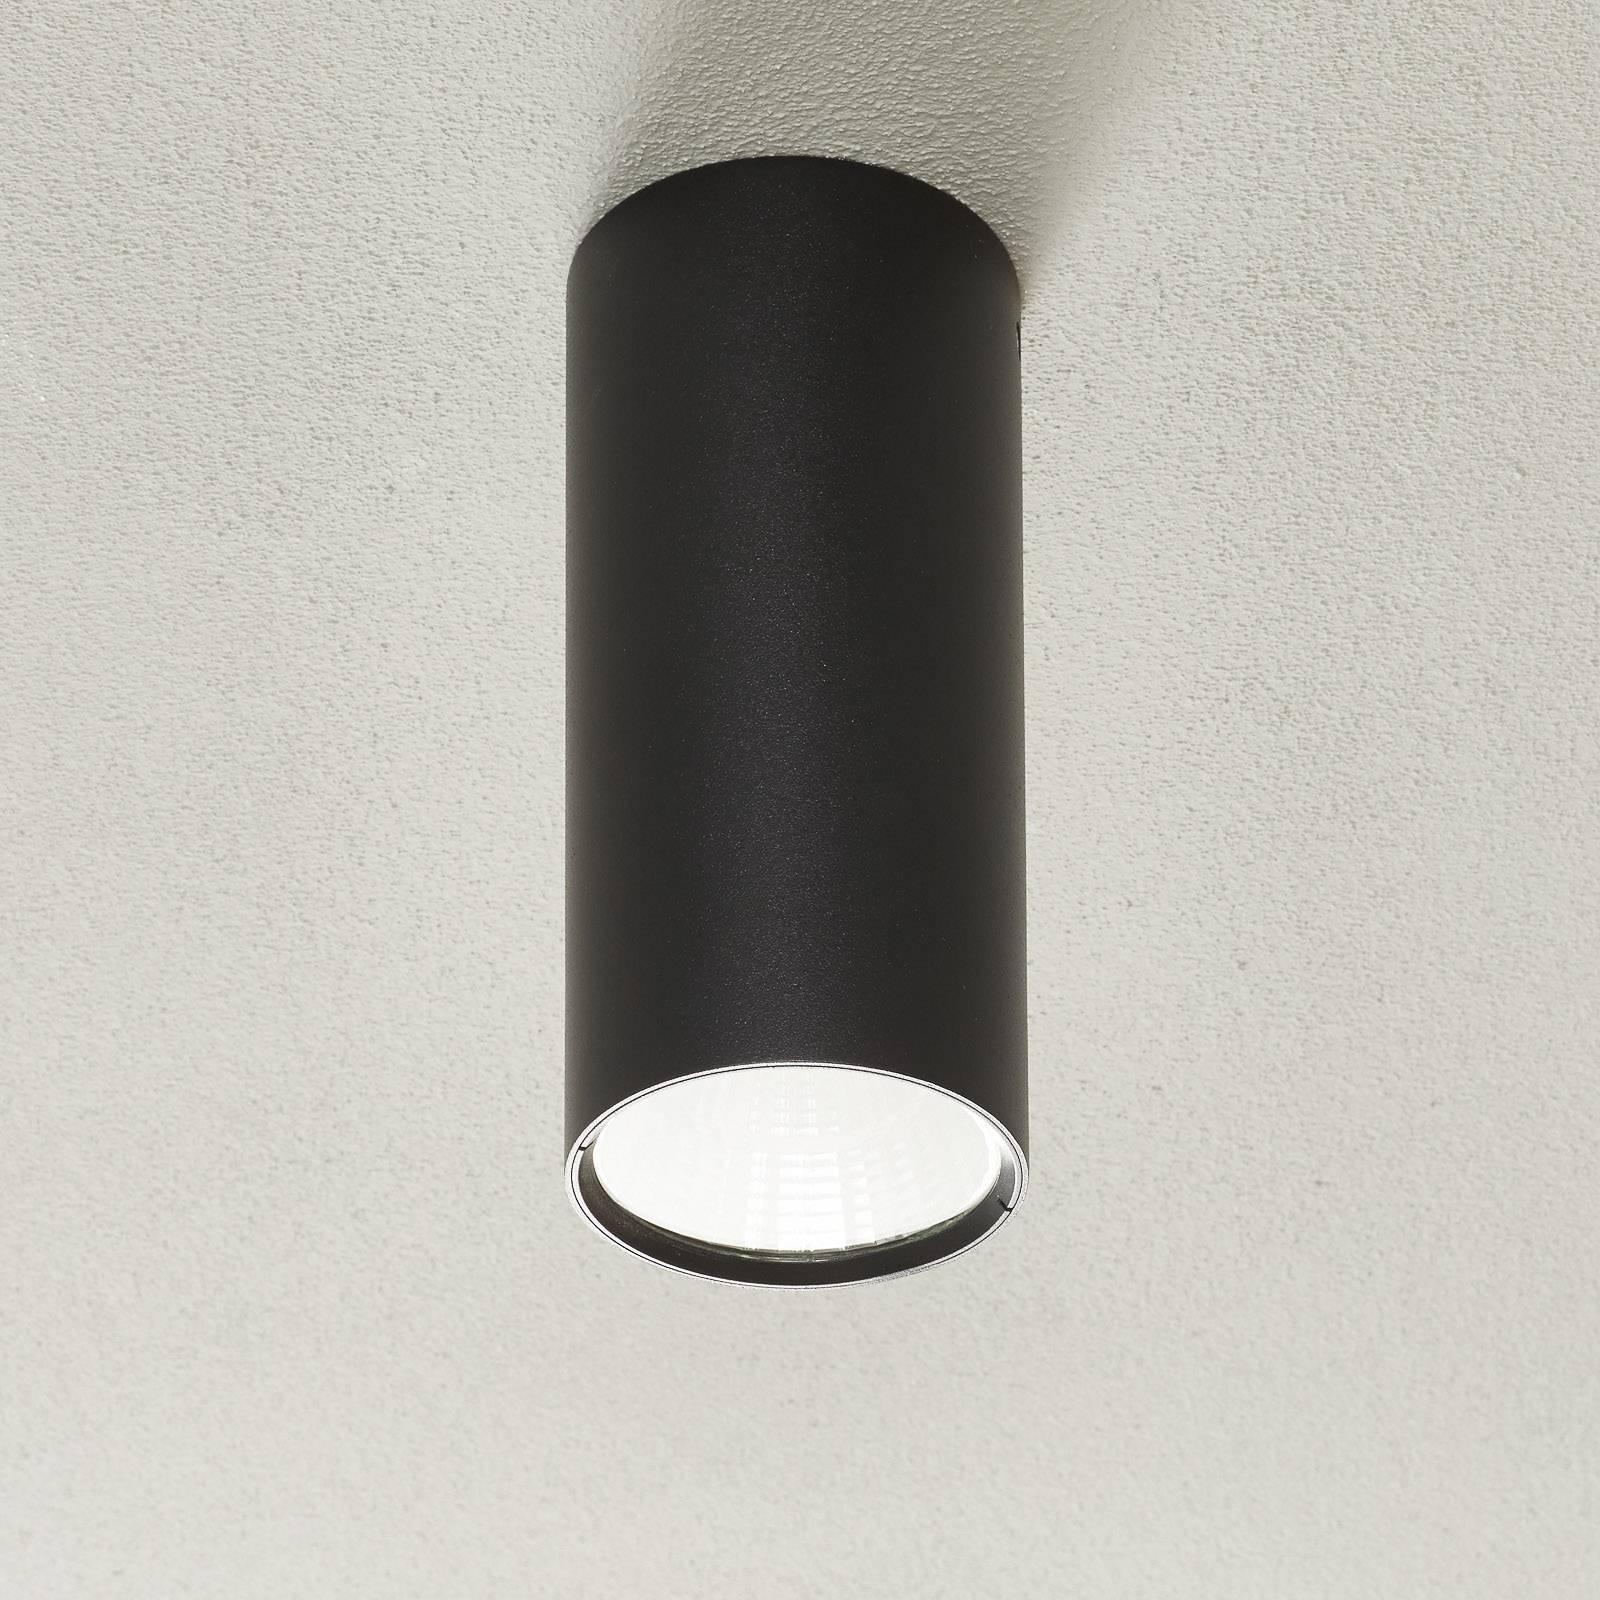 Lucande Takio LED downlight 2700K Ø10cm zwart